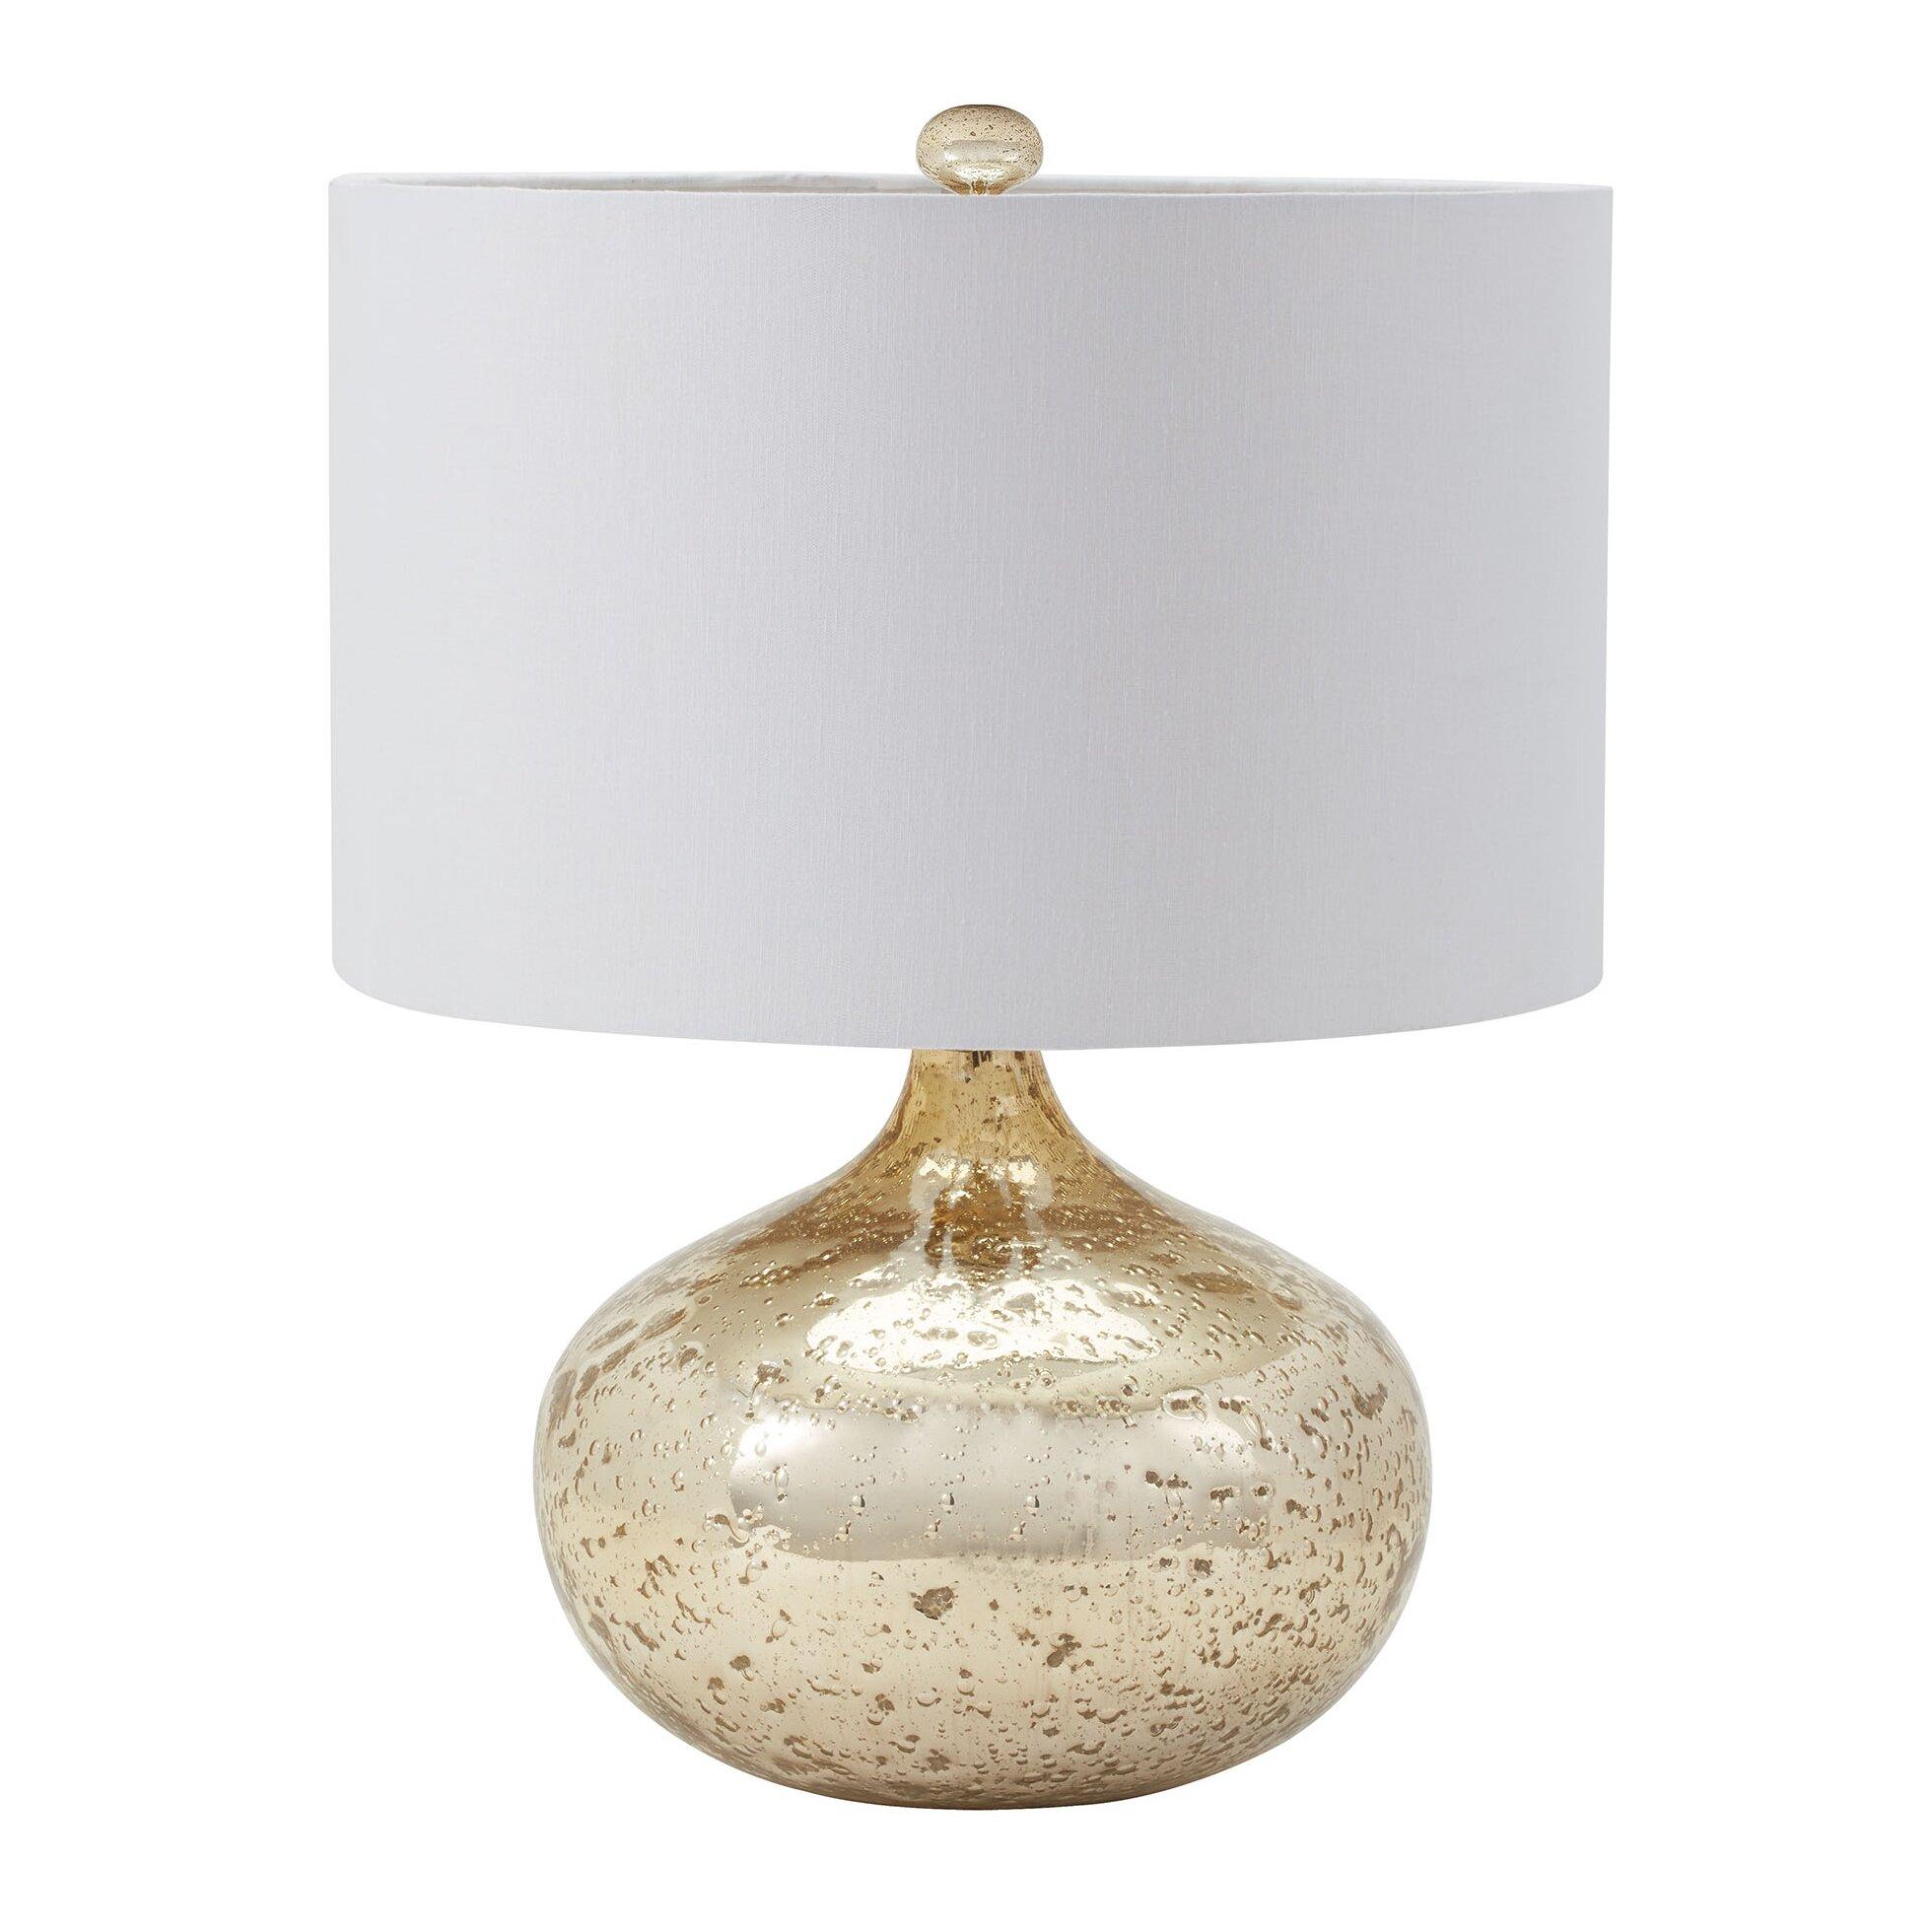 Mercury glass light fixtures - Birch Lane Mclean Mercury Glass Table Lamp